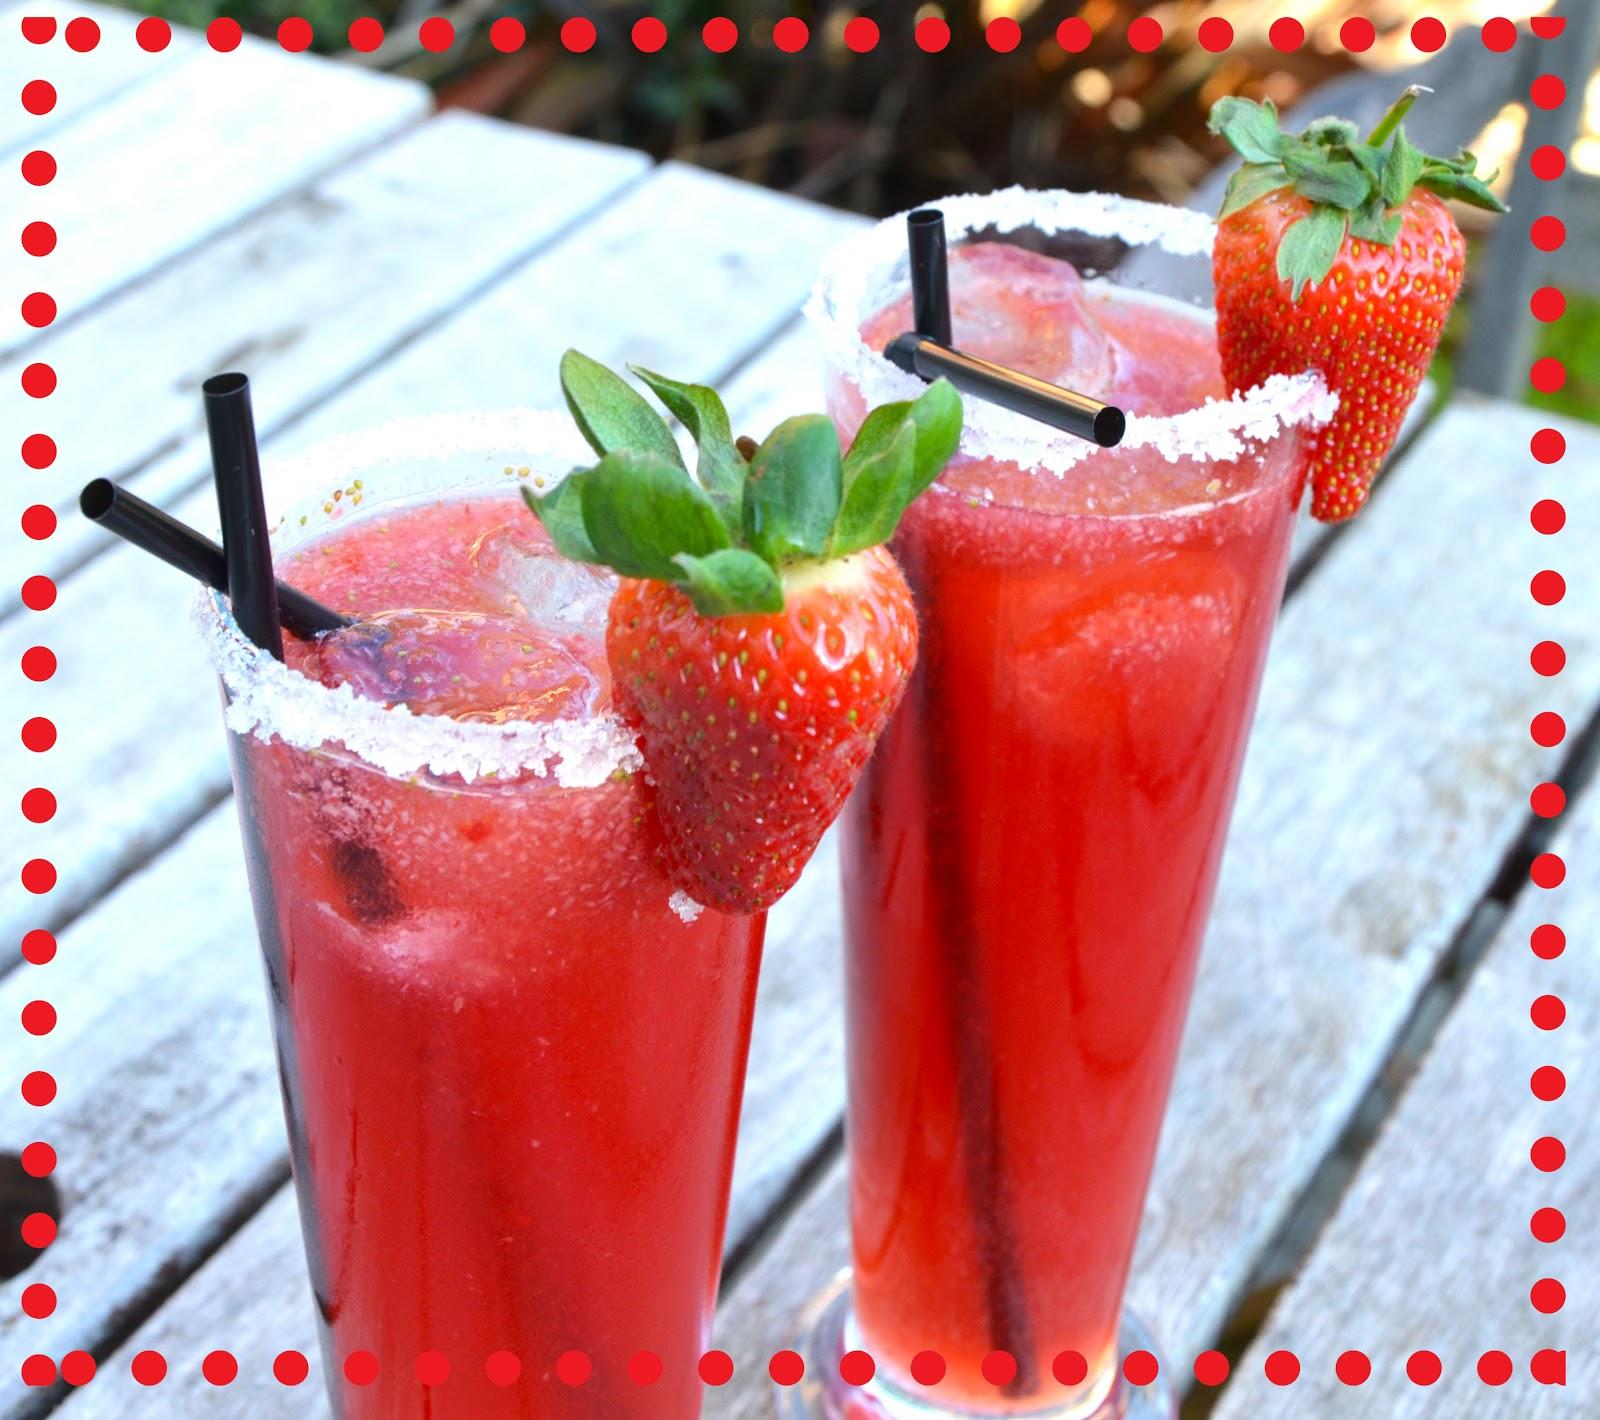 Stevie hearts makeup recipe strawberry daiquiri cocktail for Cocktail daiquiri